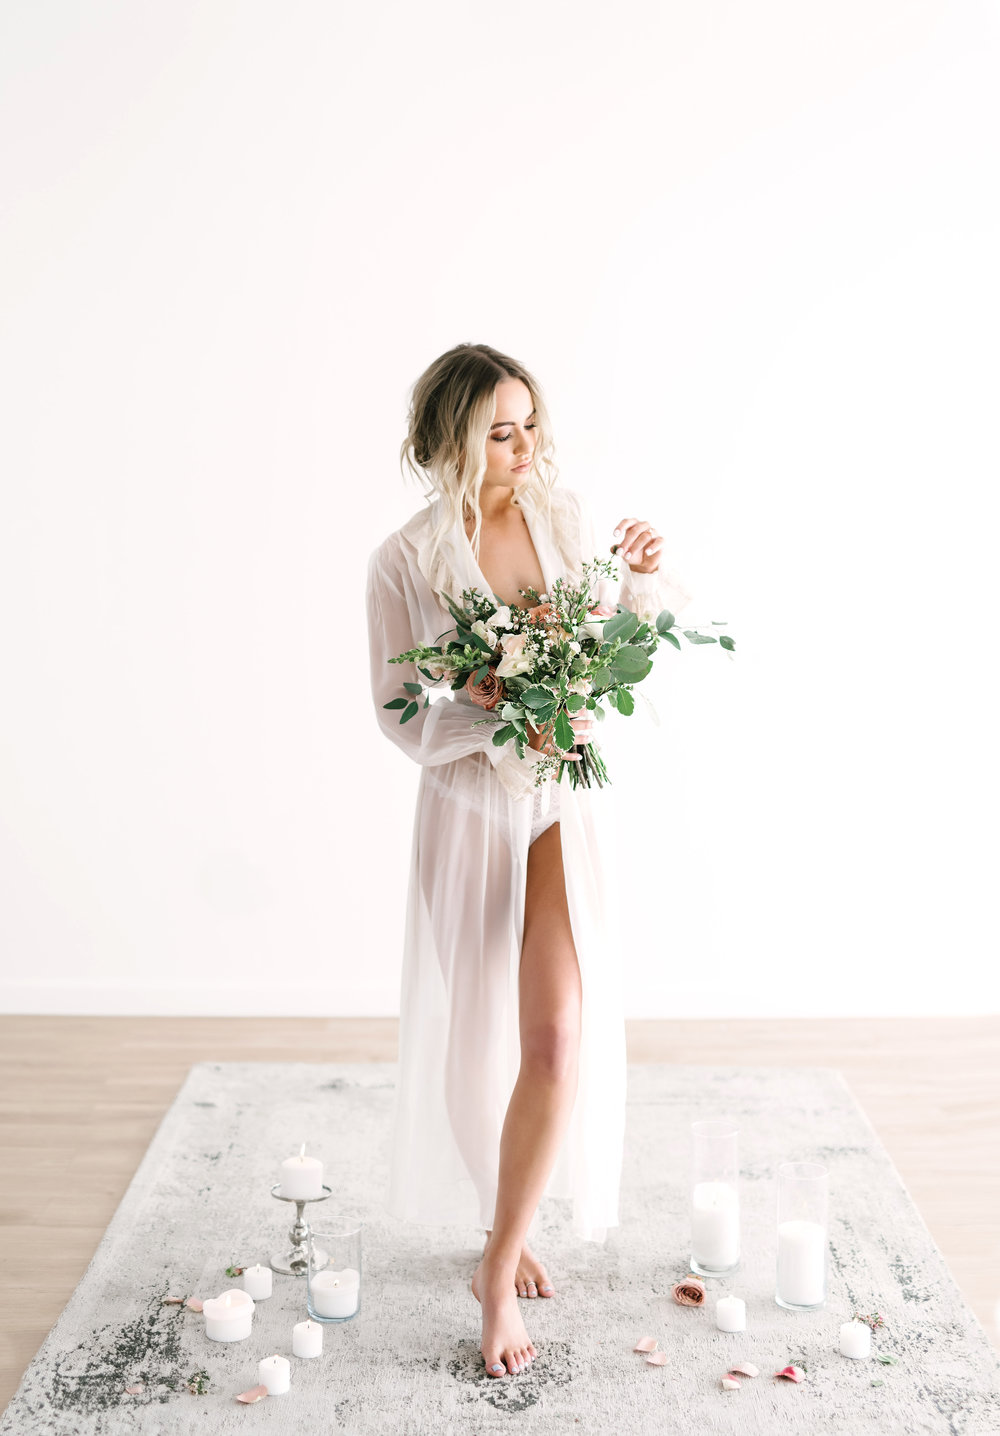 BRIDAL BOUDOIR    Ethereal Bridal Boudoir Session     Boudoir Studio,Scottsdale, AZ